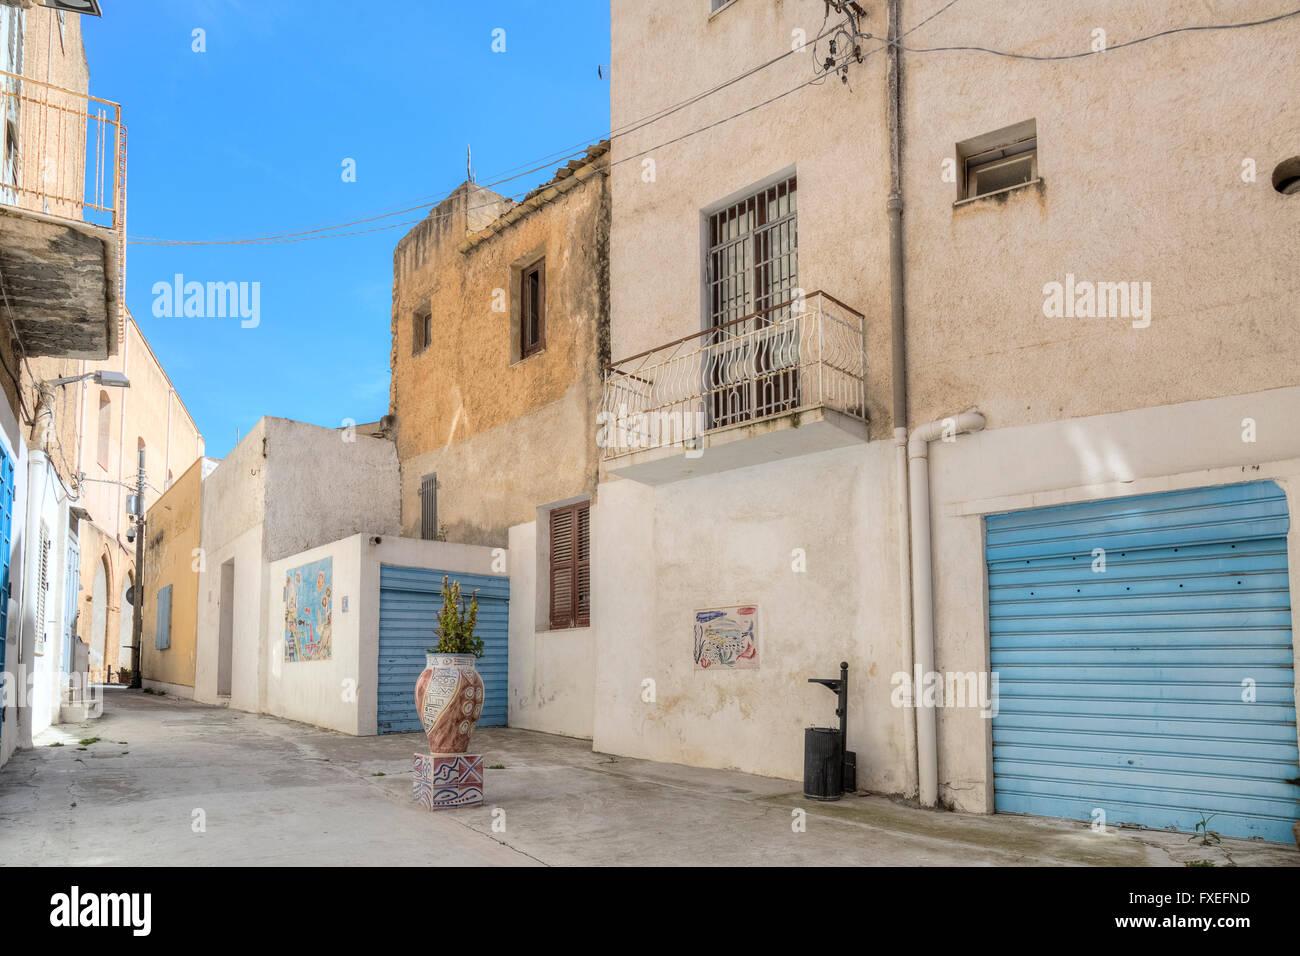 Mazara del Vallo, Kasbah, Sicily, Italy - Stock Image